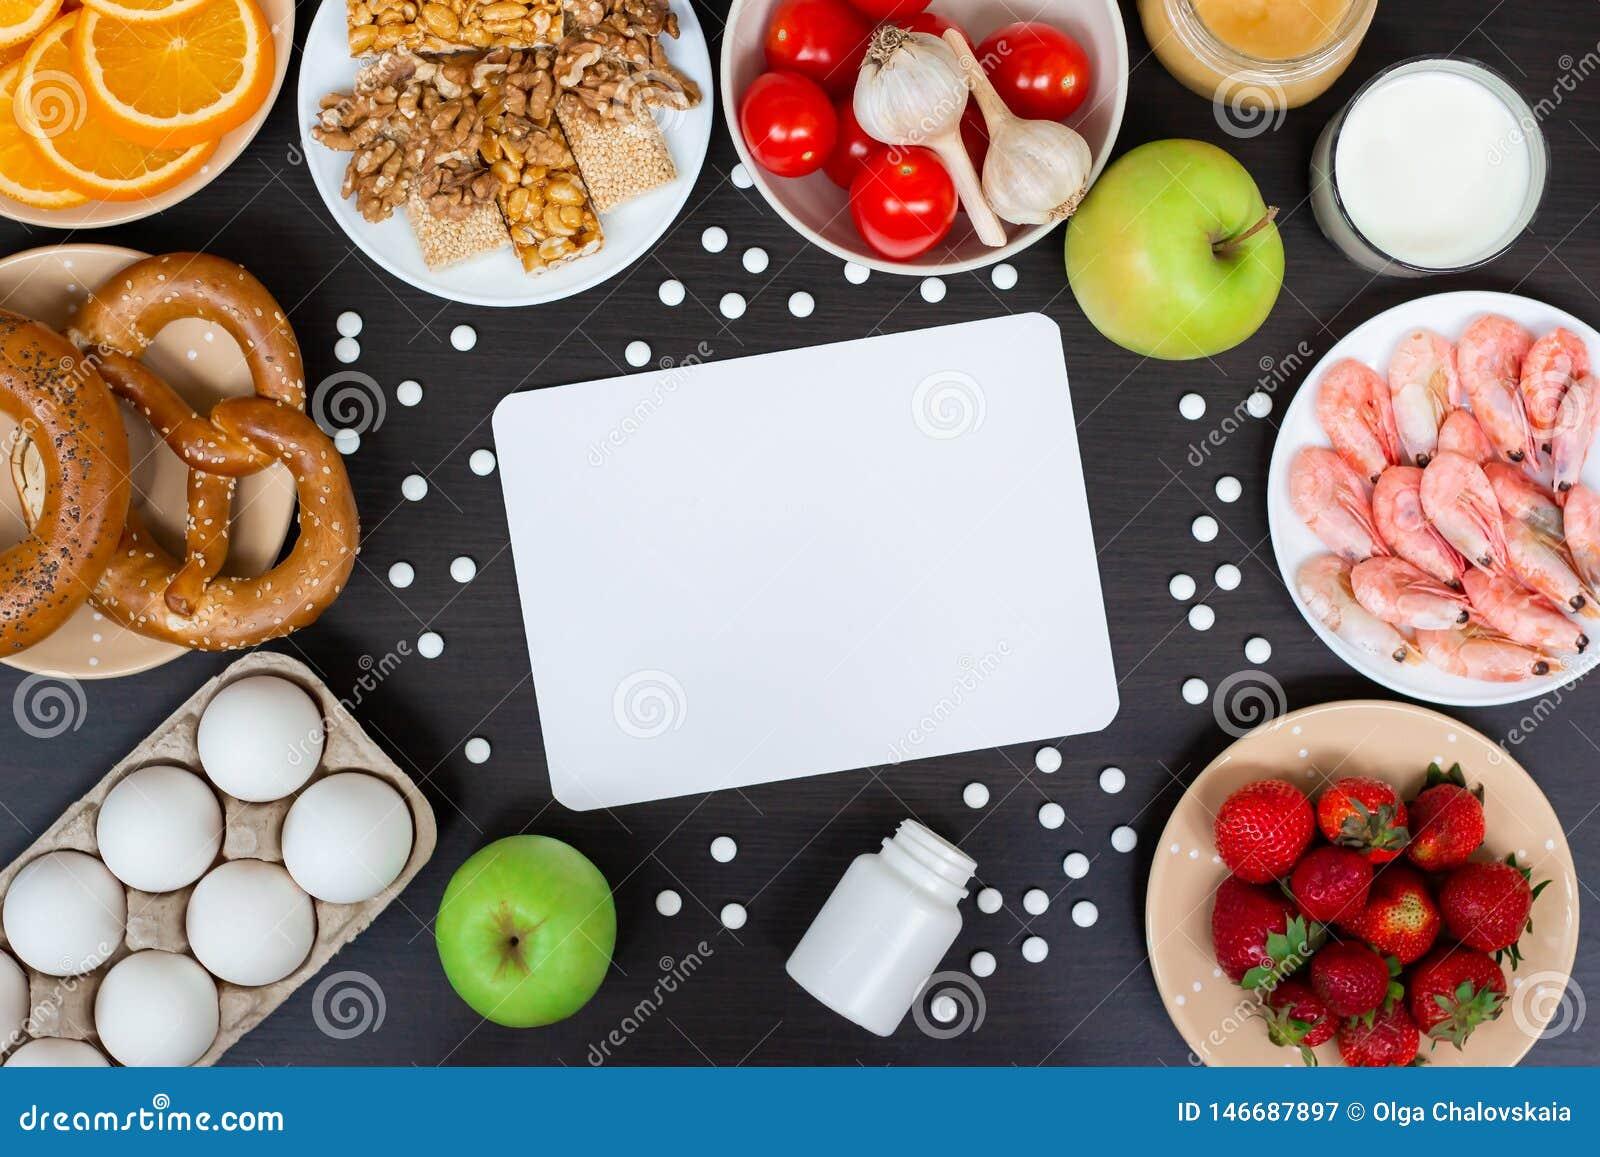 Set of allergic products as milk, oranges, tomatoes, garlic, shrimp, peanuts, eggs, apples, bread, strawberries